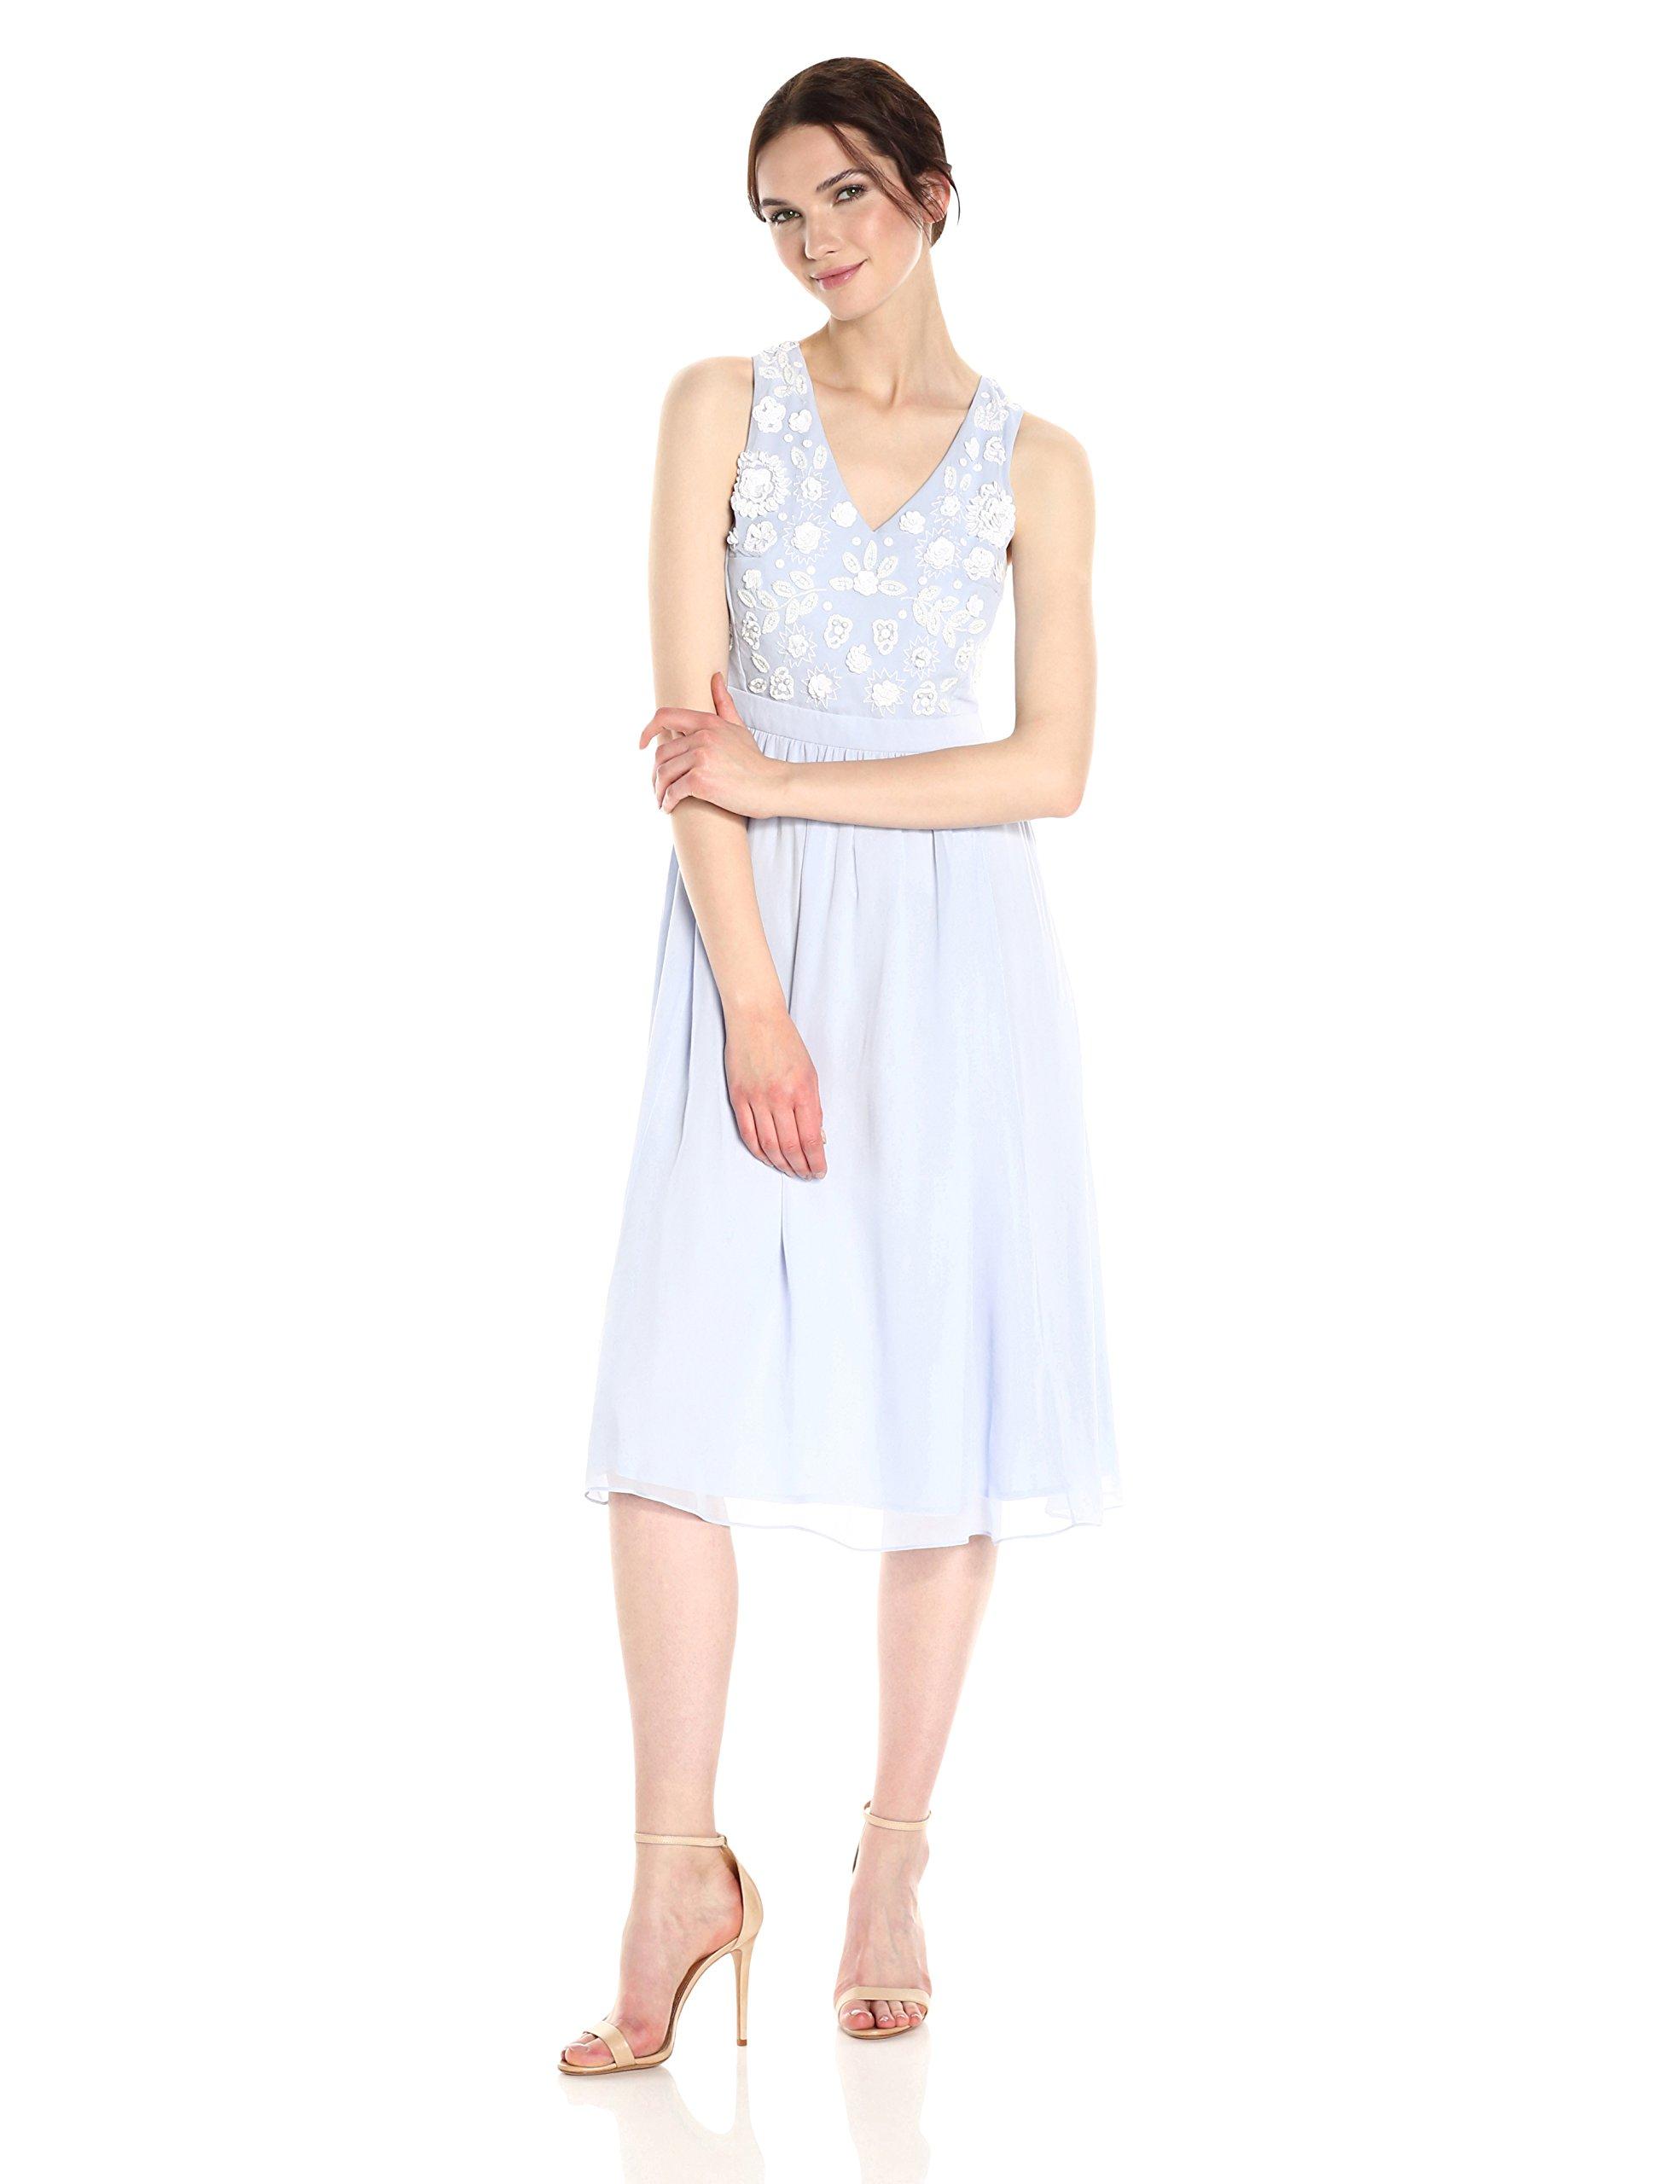 French Connection Women's Dalia Sheer Dress, Salt Water/Summer White, 12